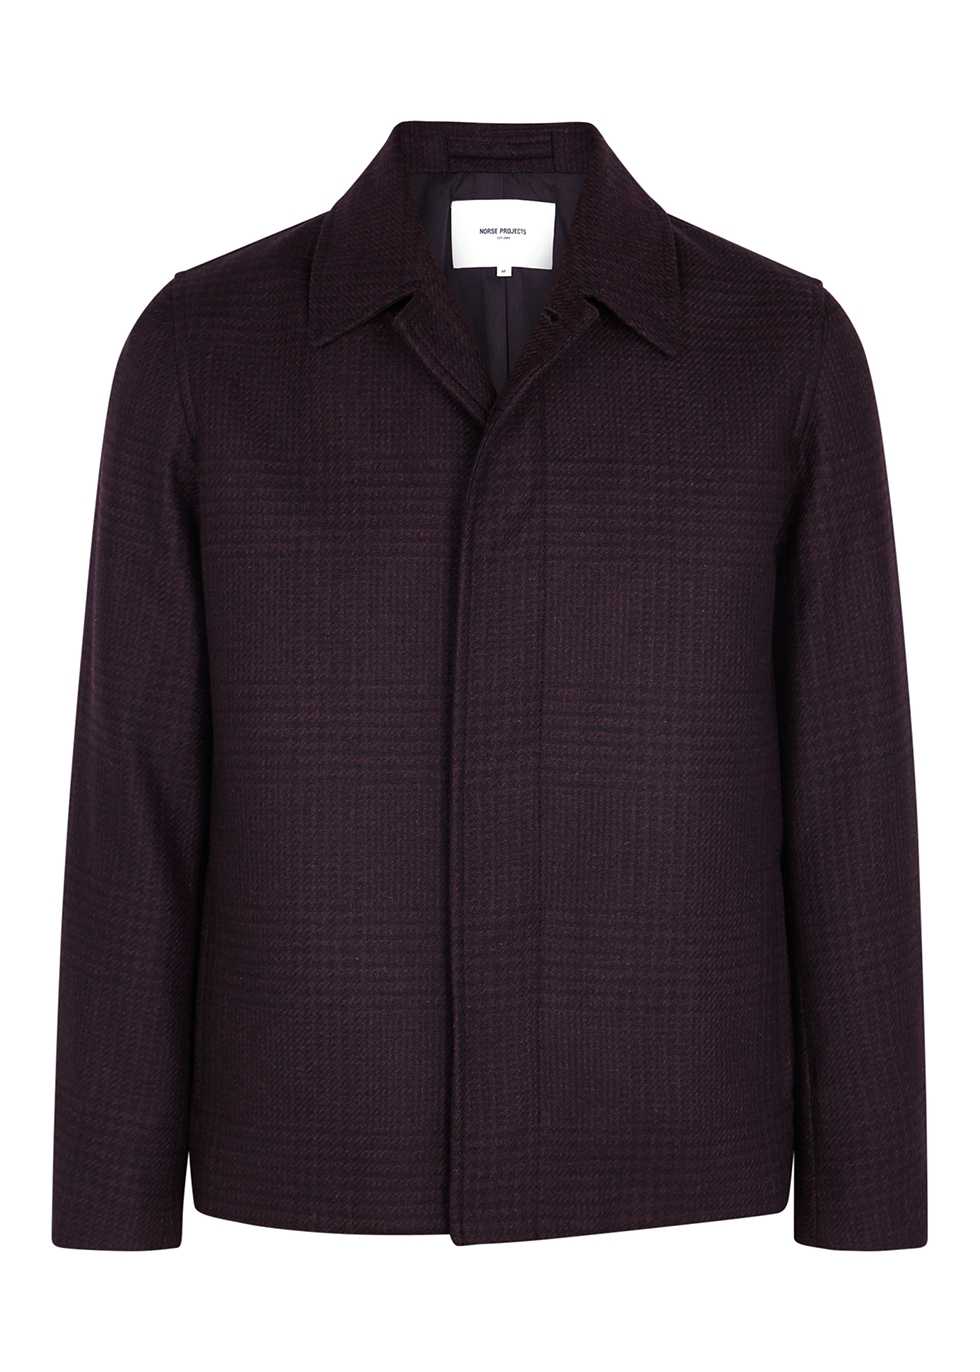 Burgundy checked wool-blend jacket